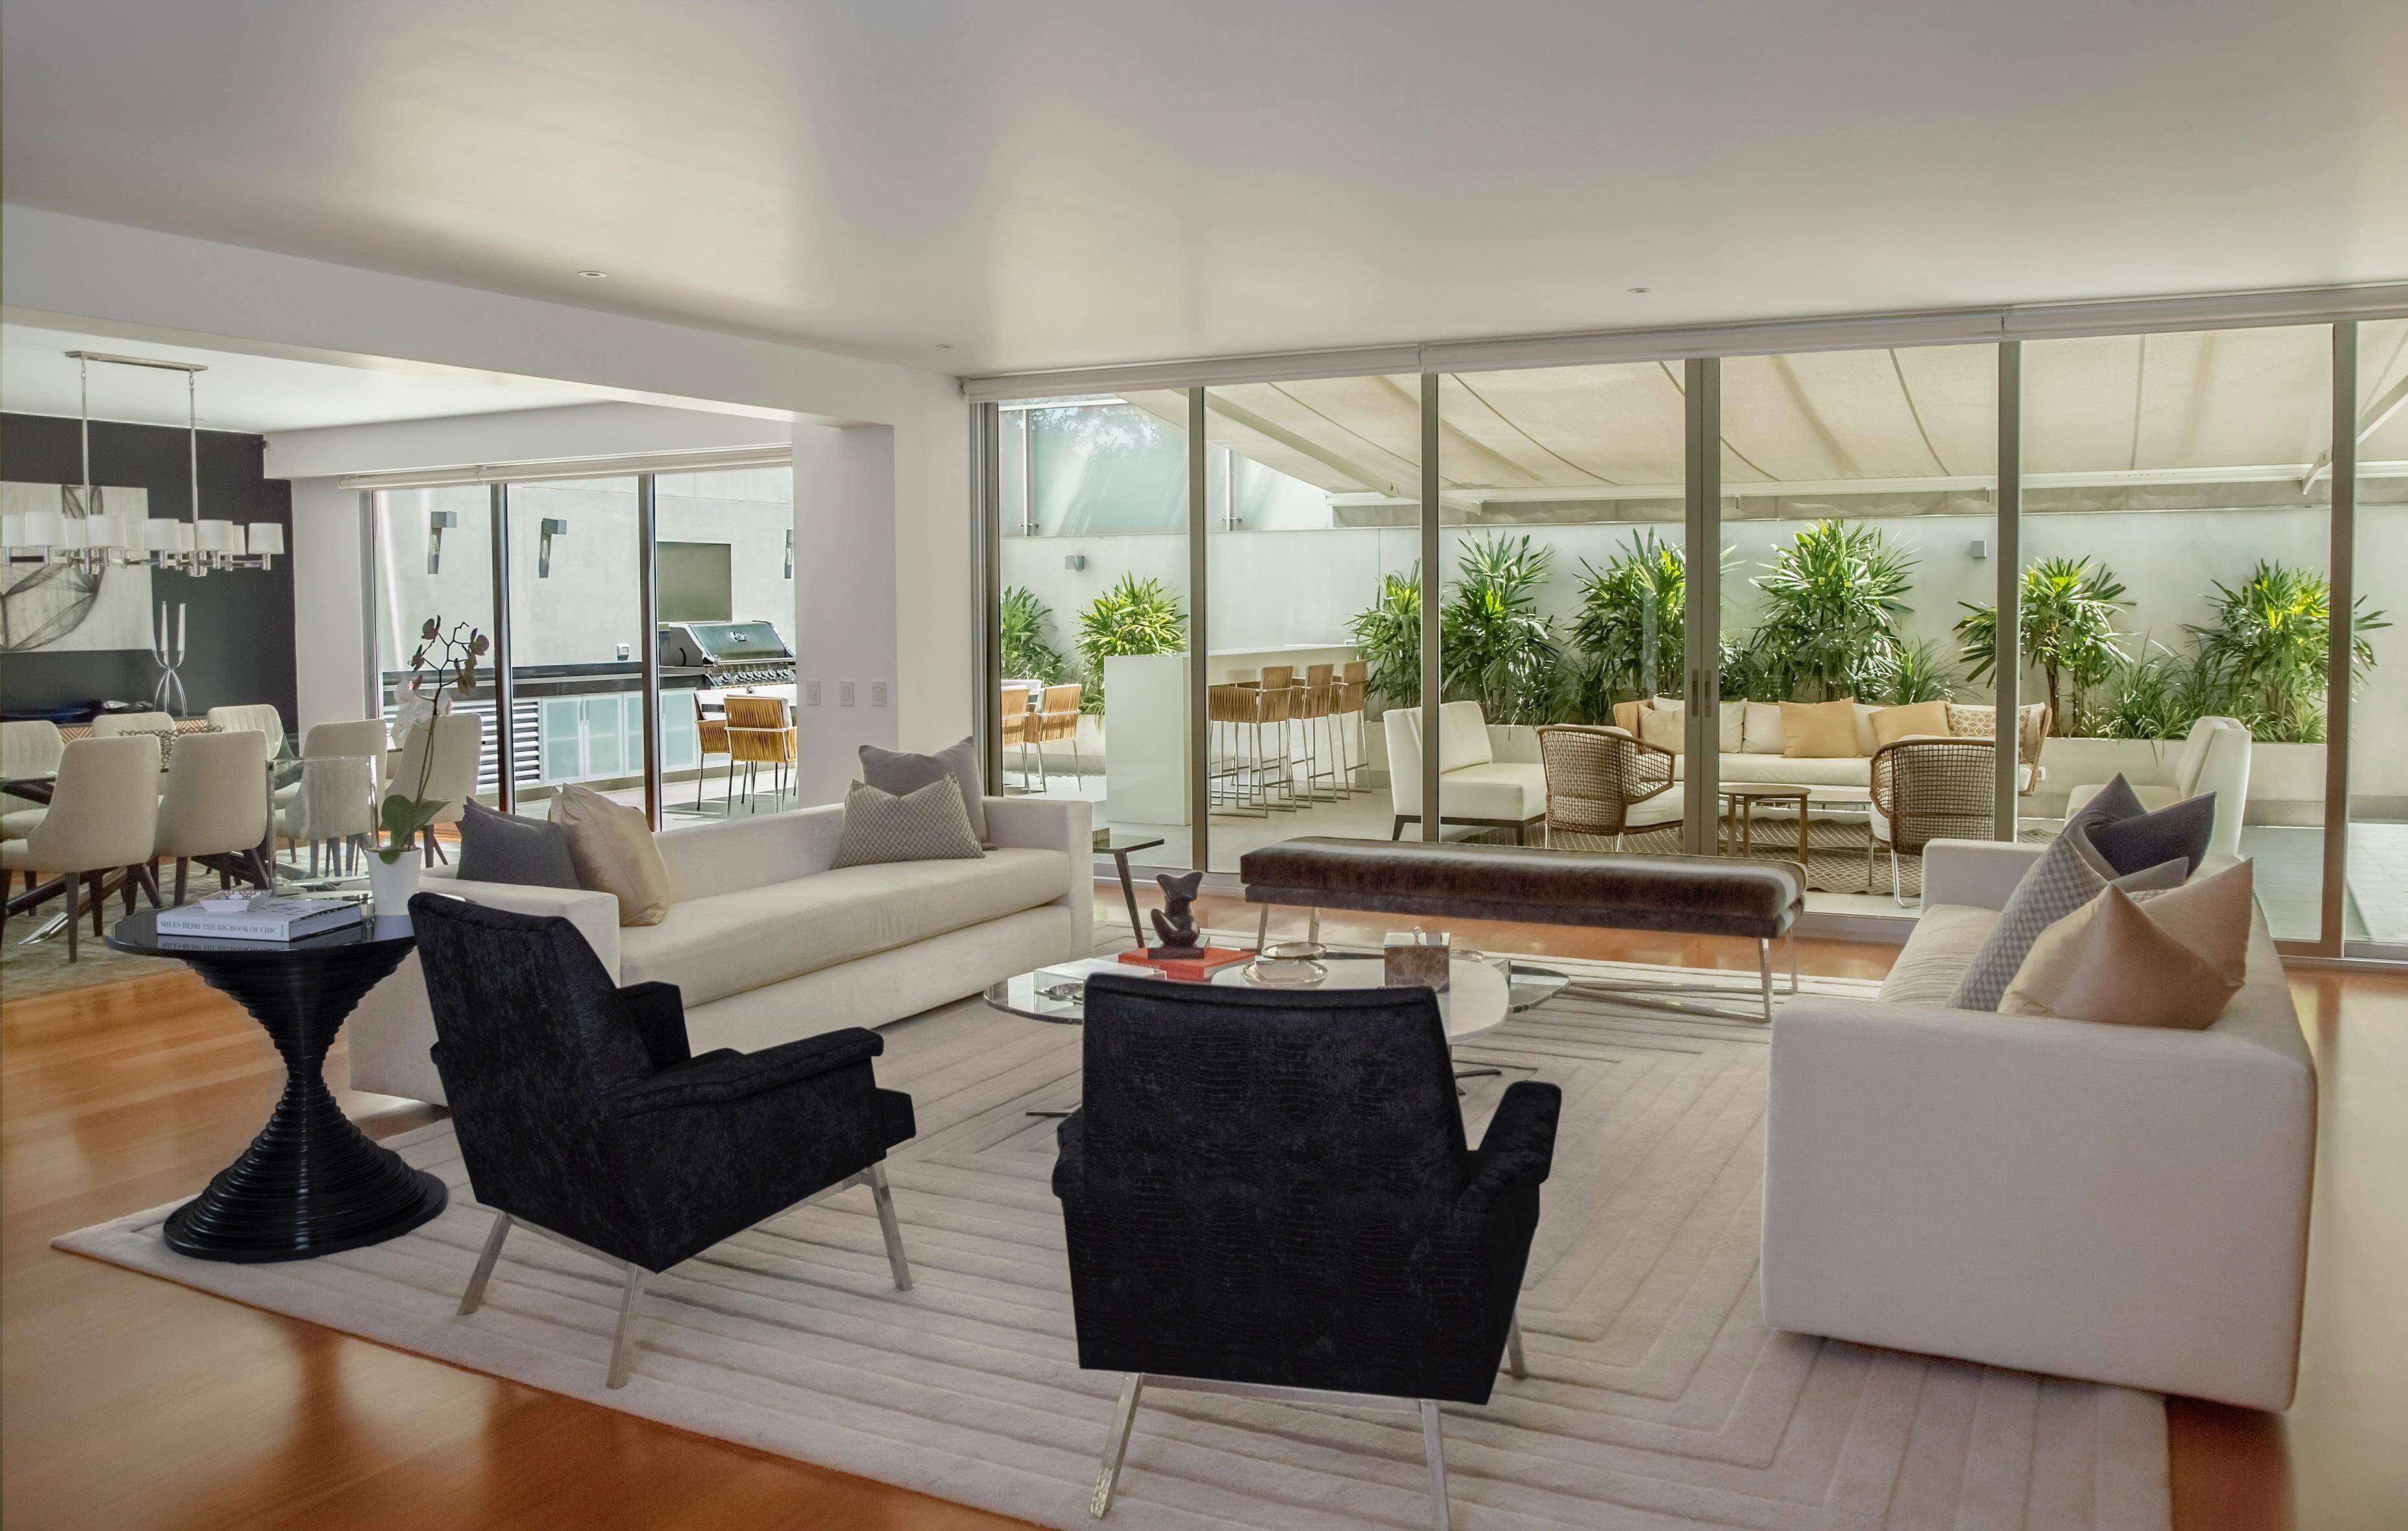 NV Maintenance Services New York, Connecticut & New Jersey - Open Concept Floorplan